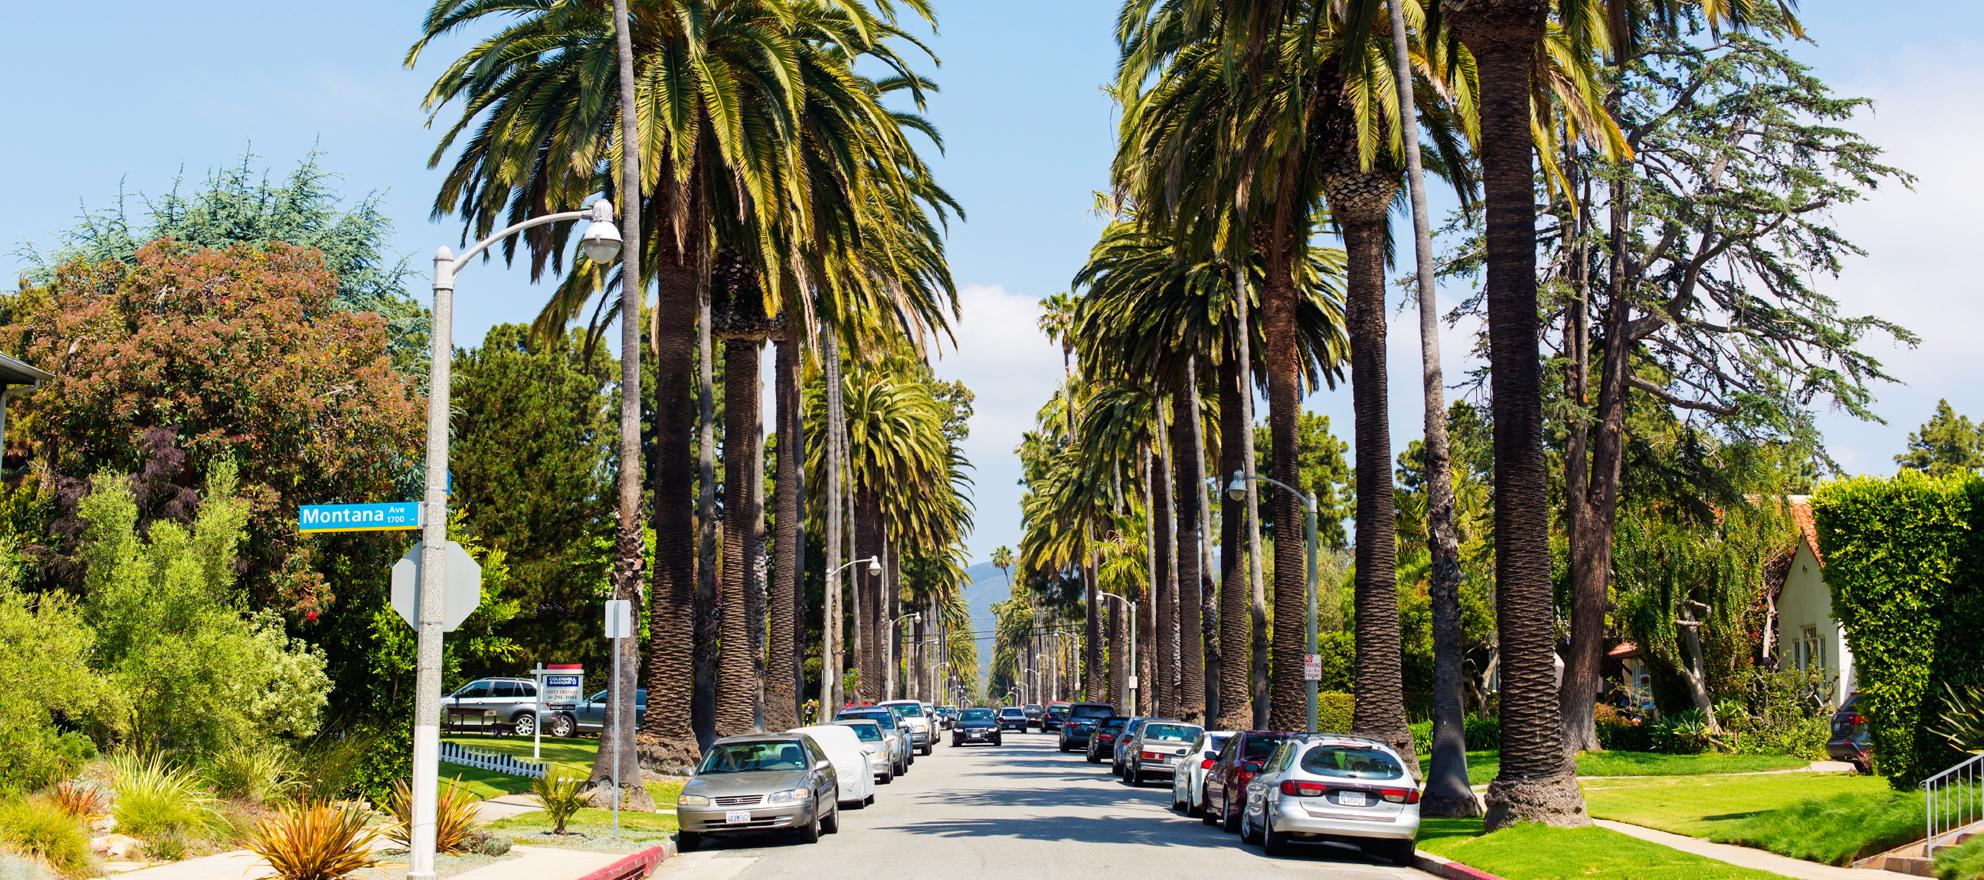 Los Angeles homes